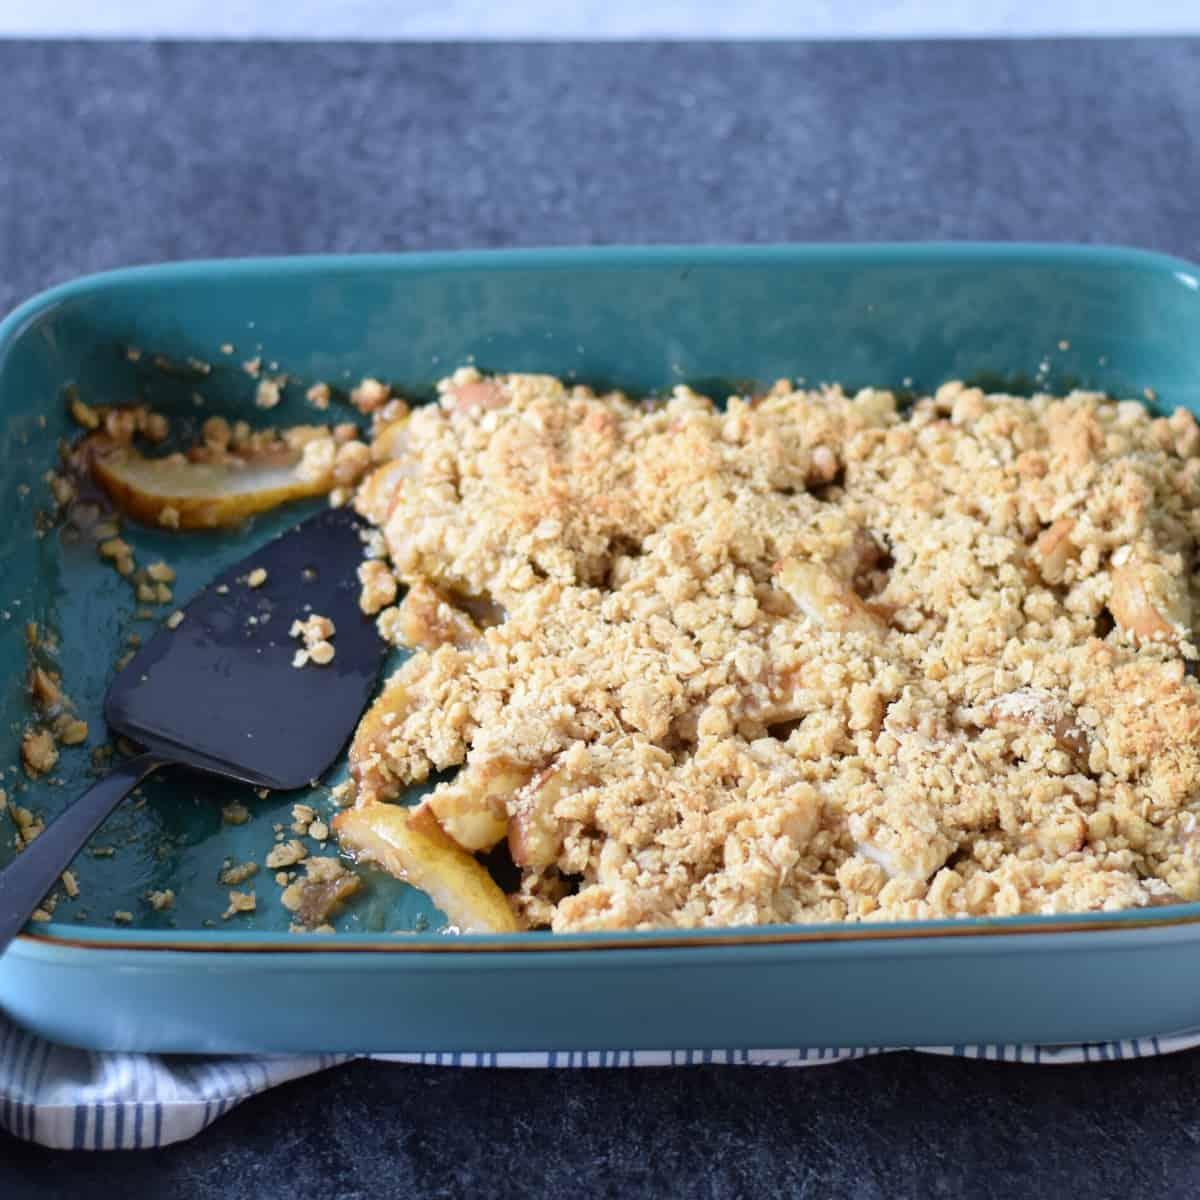 pear crisp in a blue baking dish